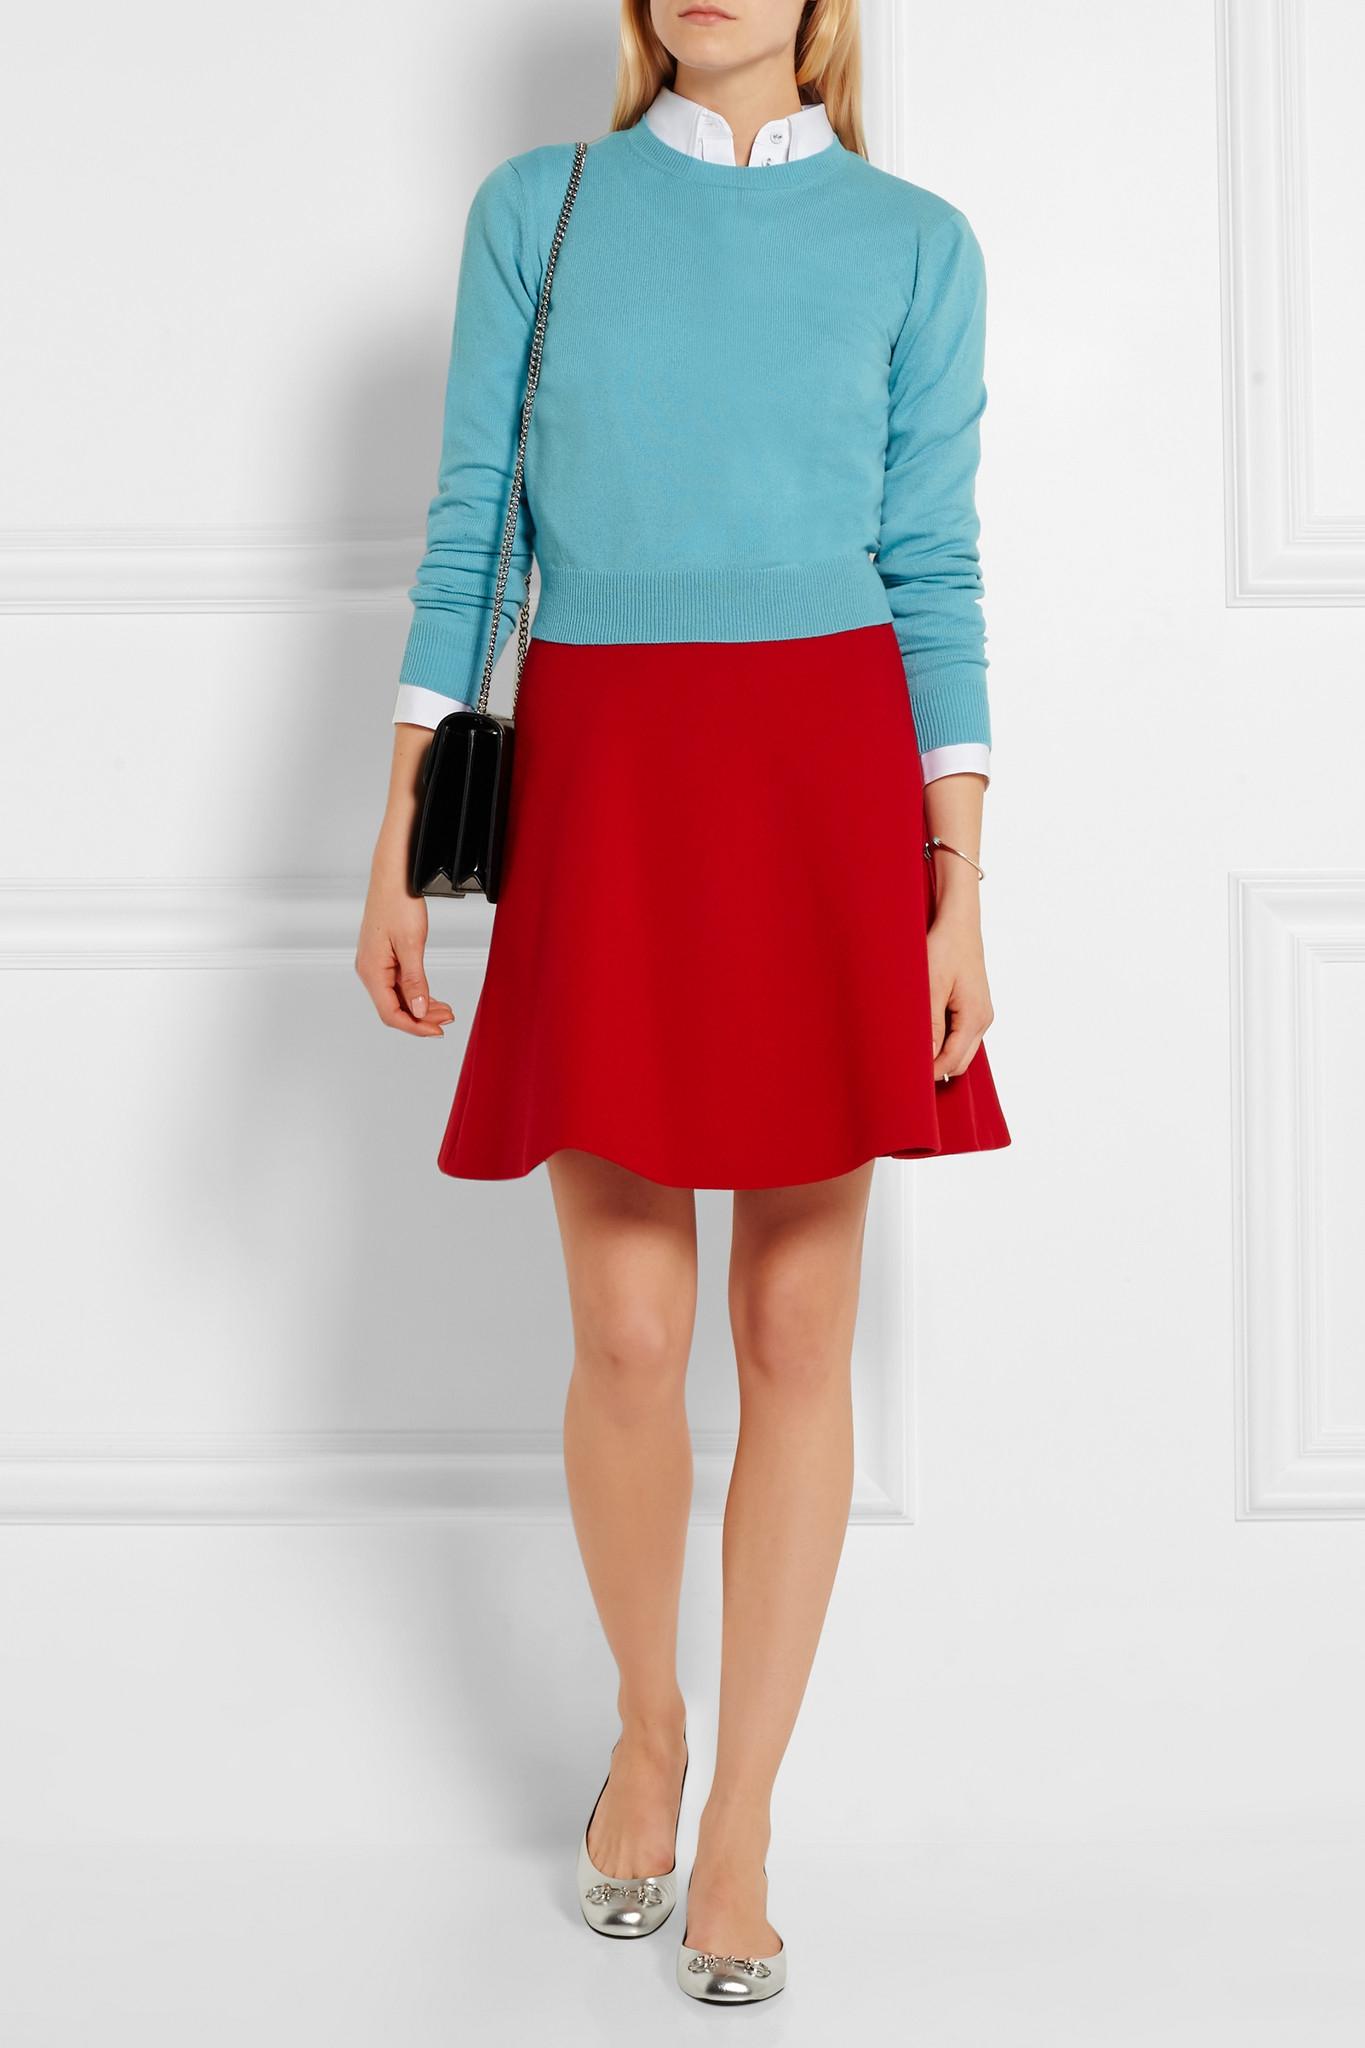 Lyst - Miu Miu - Wool-crepe Mini Skirt - Red in Red 344ace9befedf